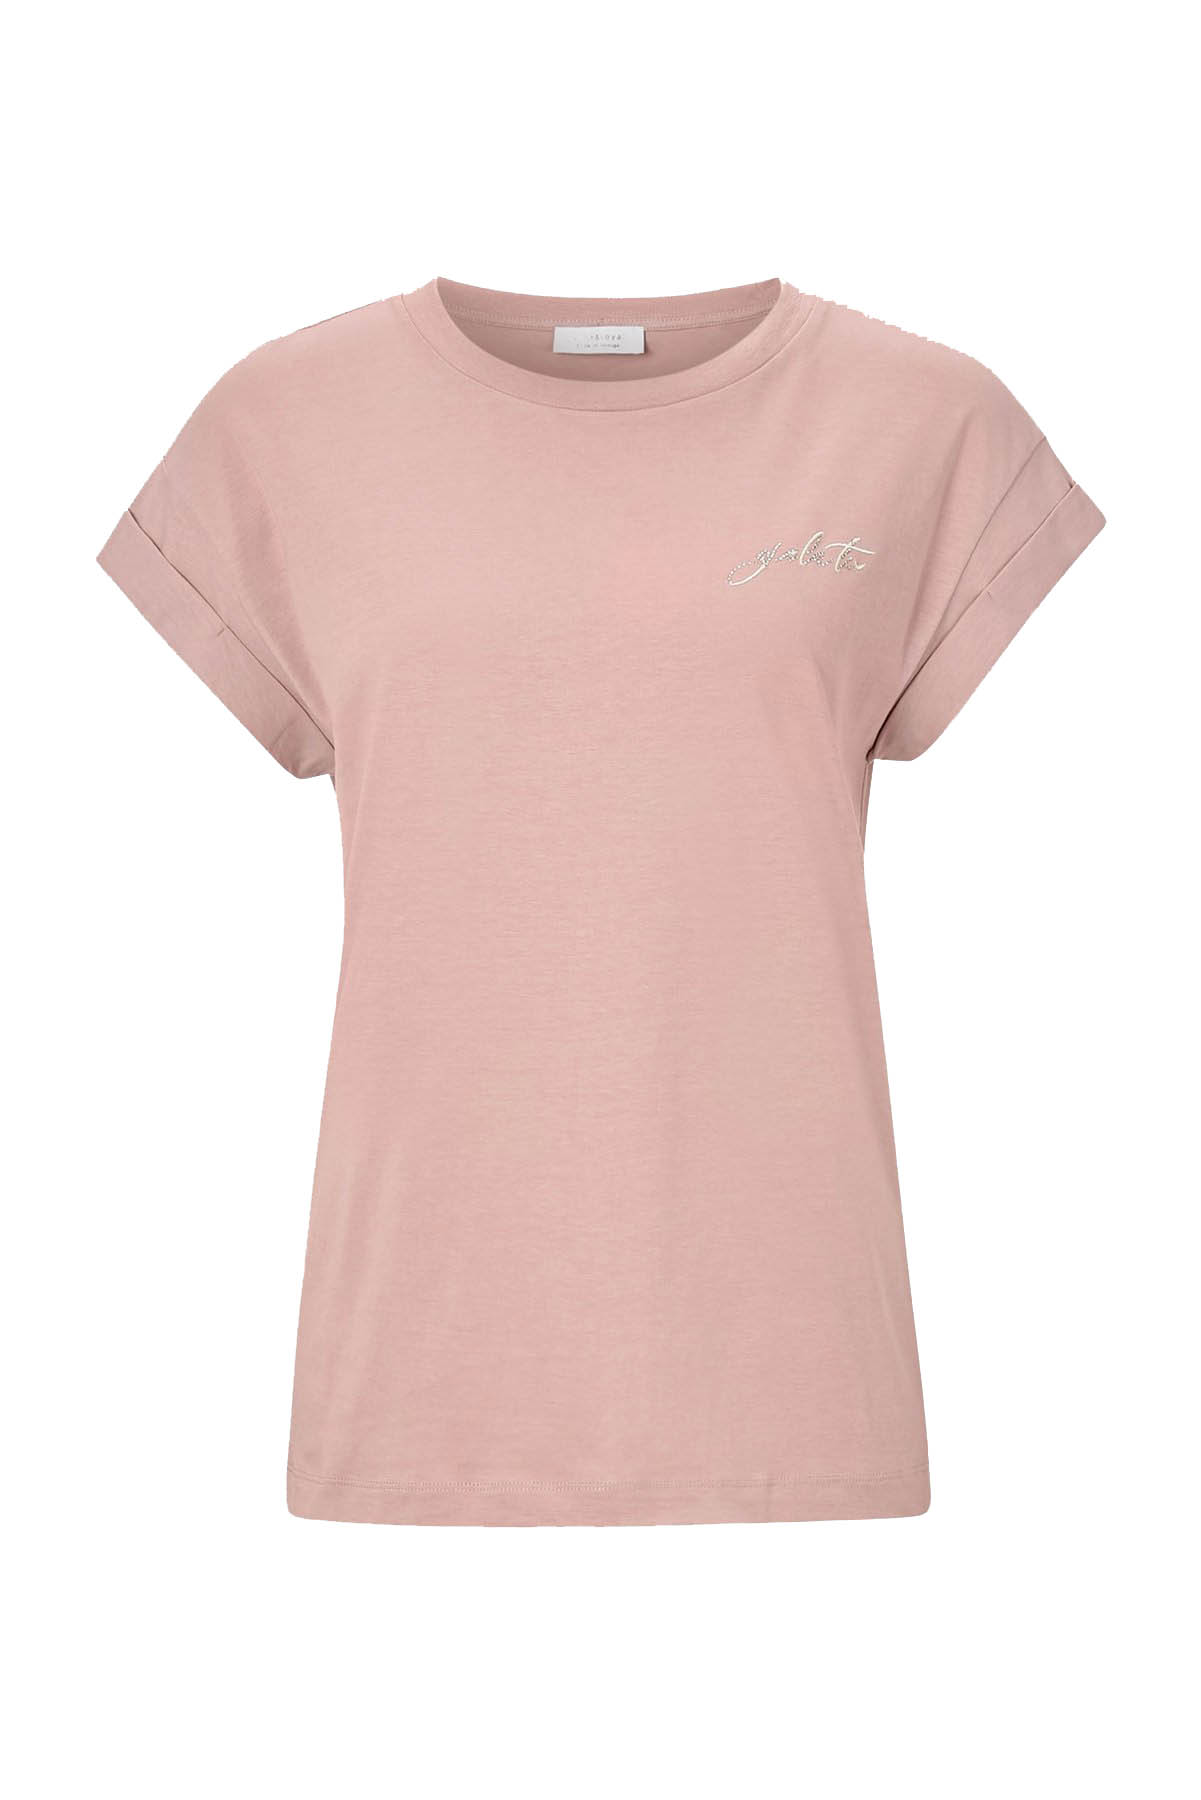 Boyfriend Coloured Sparkle Shirt